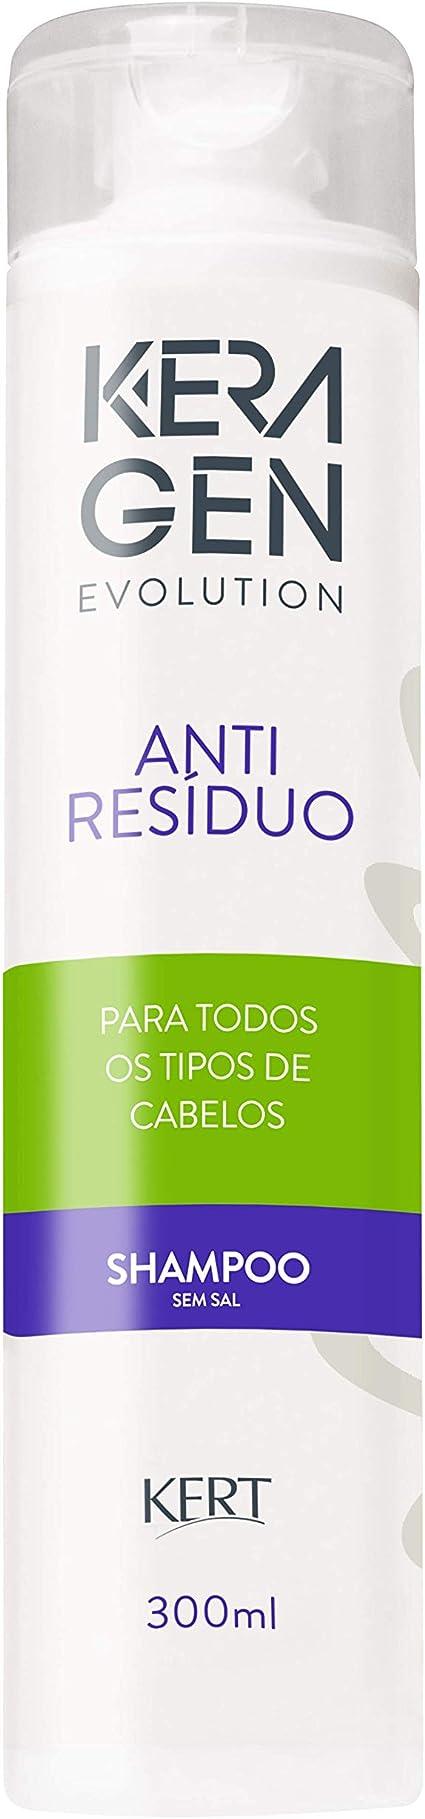 Shampoo Evolution Antirresíduo, Keragen